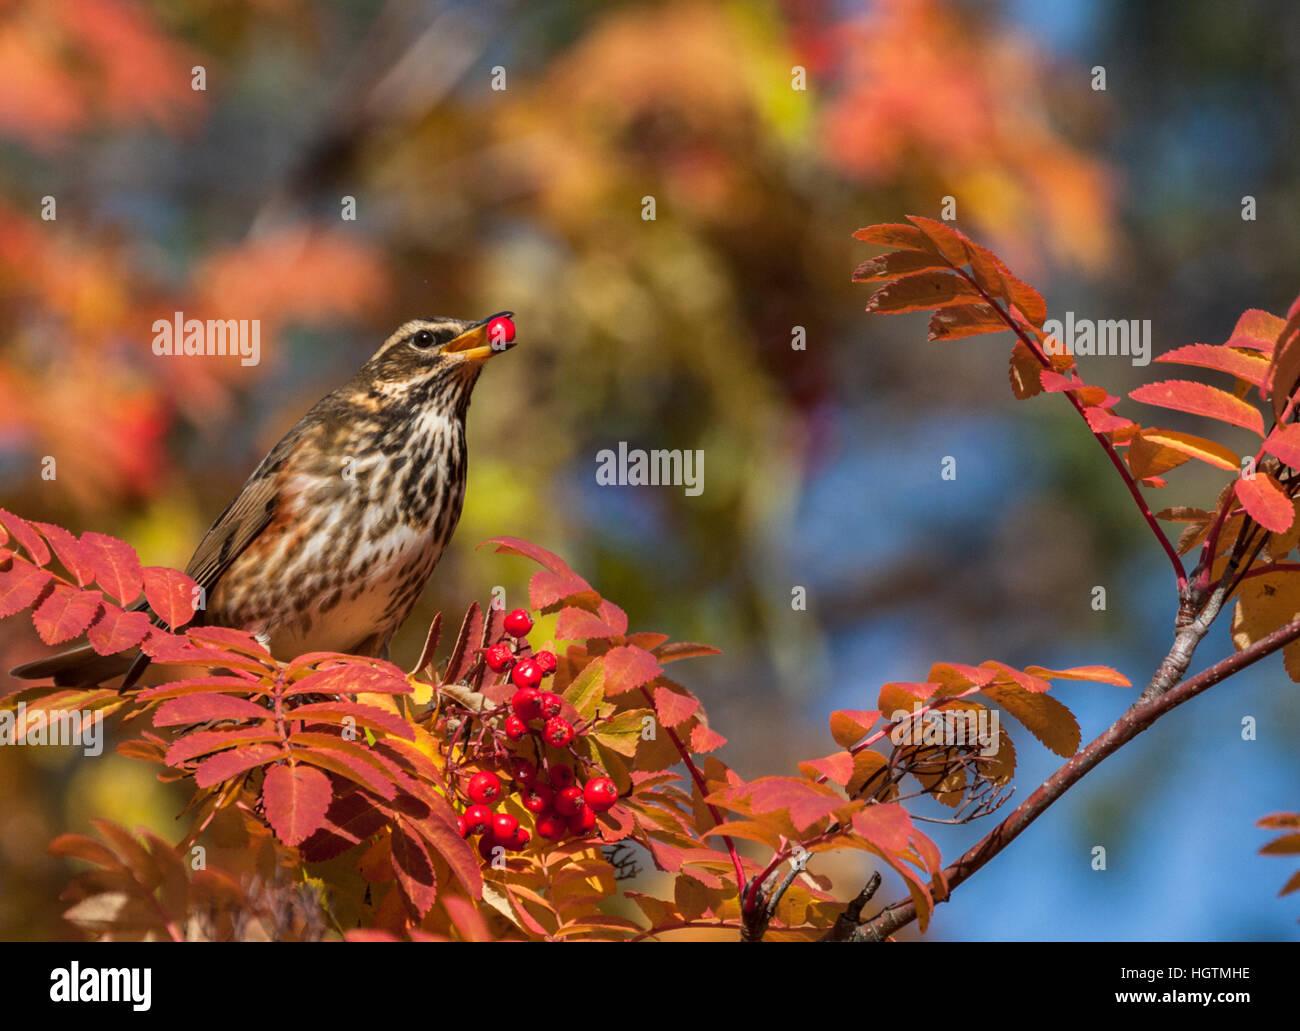 Fieldfare in rowan tree eating rowan berries, having one in his beak, nice autumn color on the tree and leaves, - Stock Image